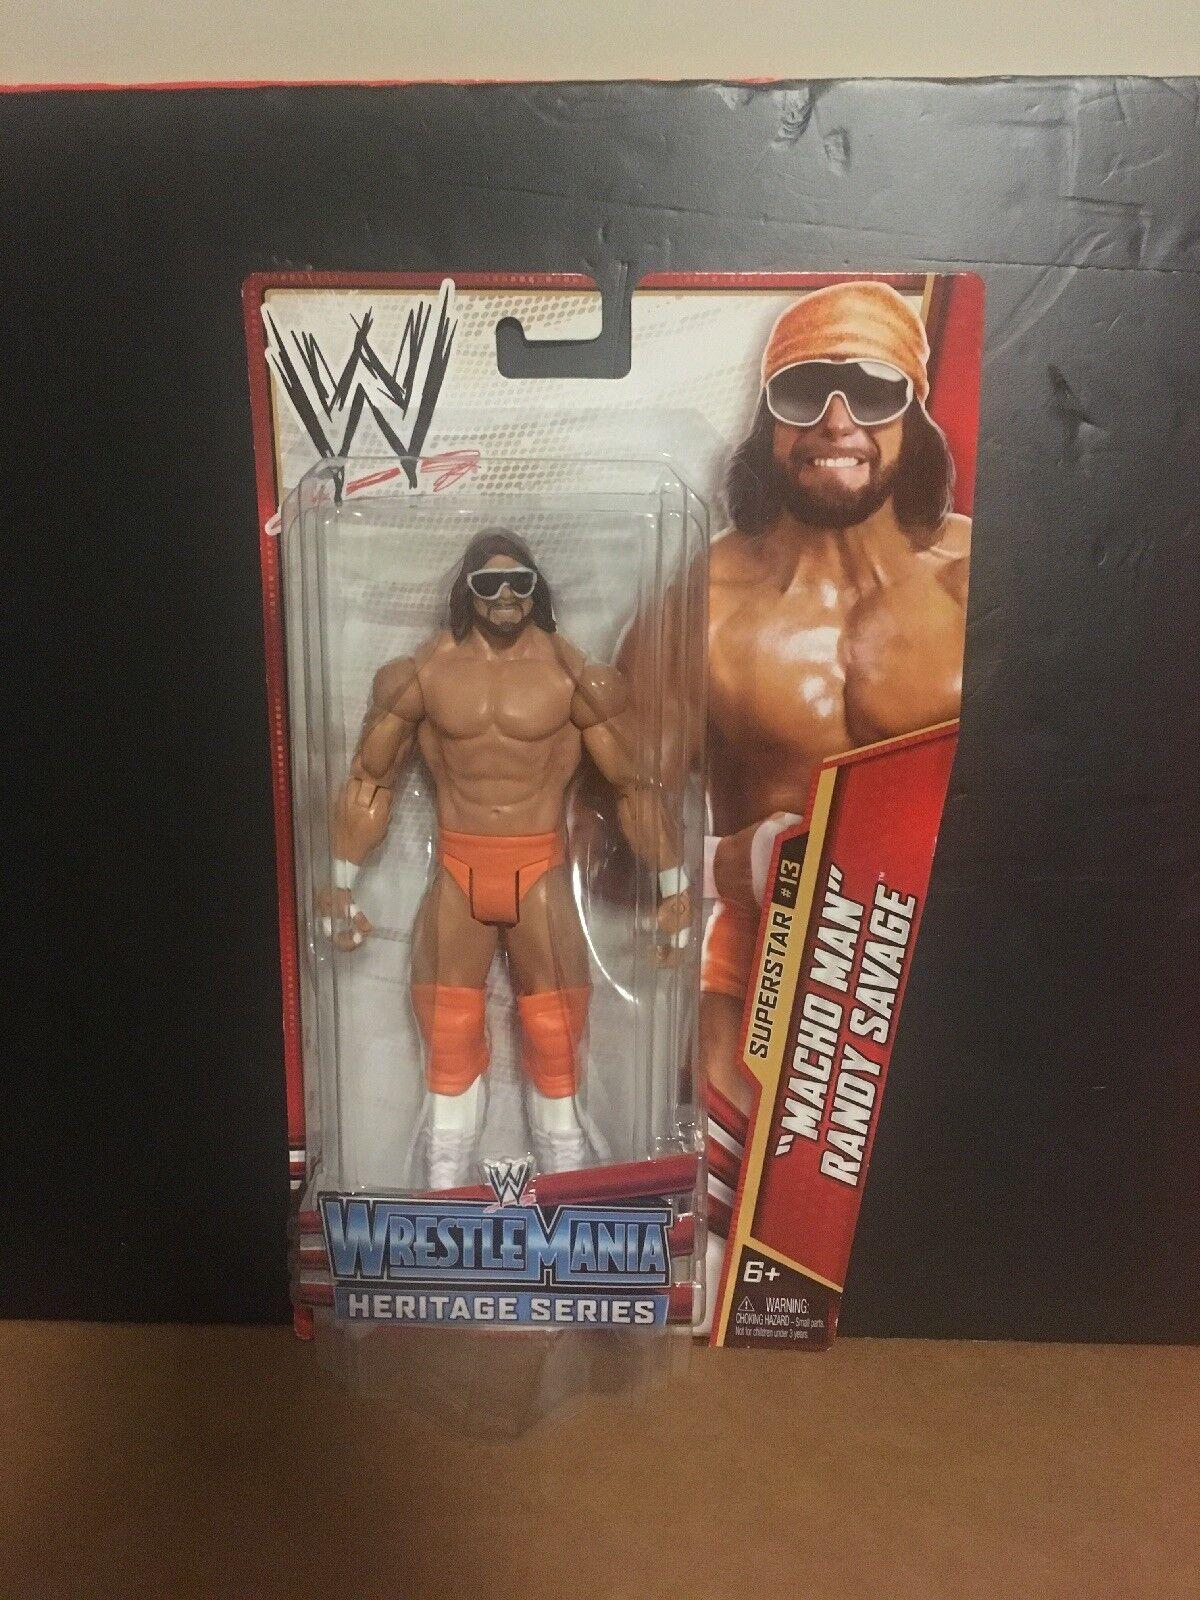 WWE MACHO MAN RANDY SAVAGE - WRESTLEMANIA 5 HERITAGE Basic SERIES 26 Figure Rare